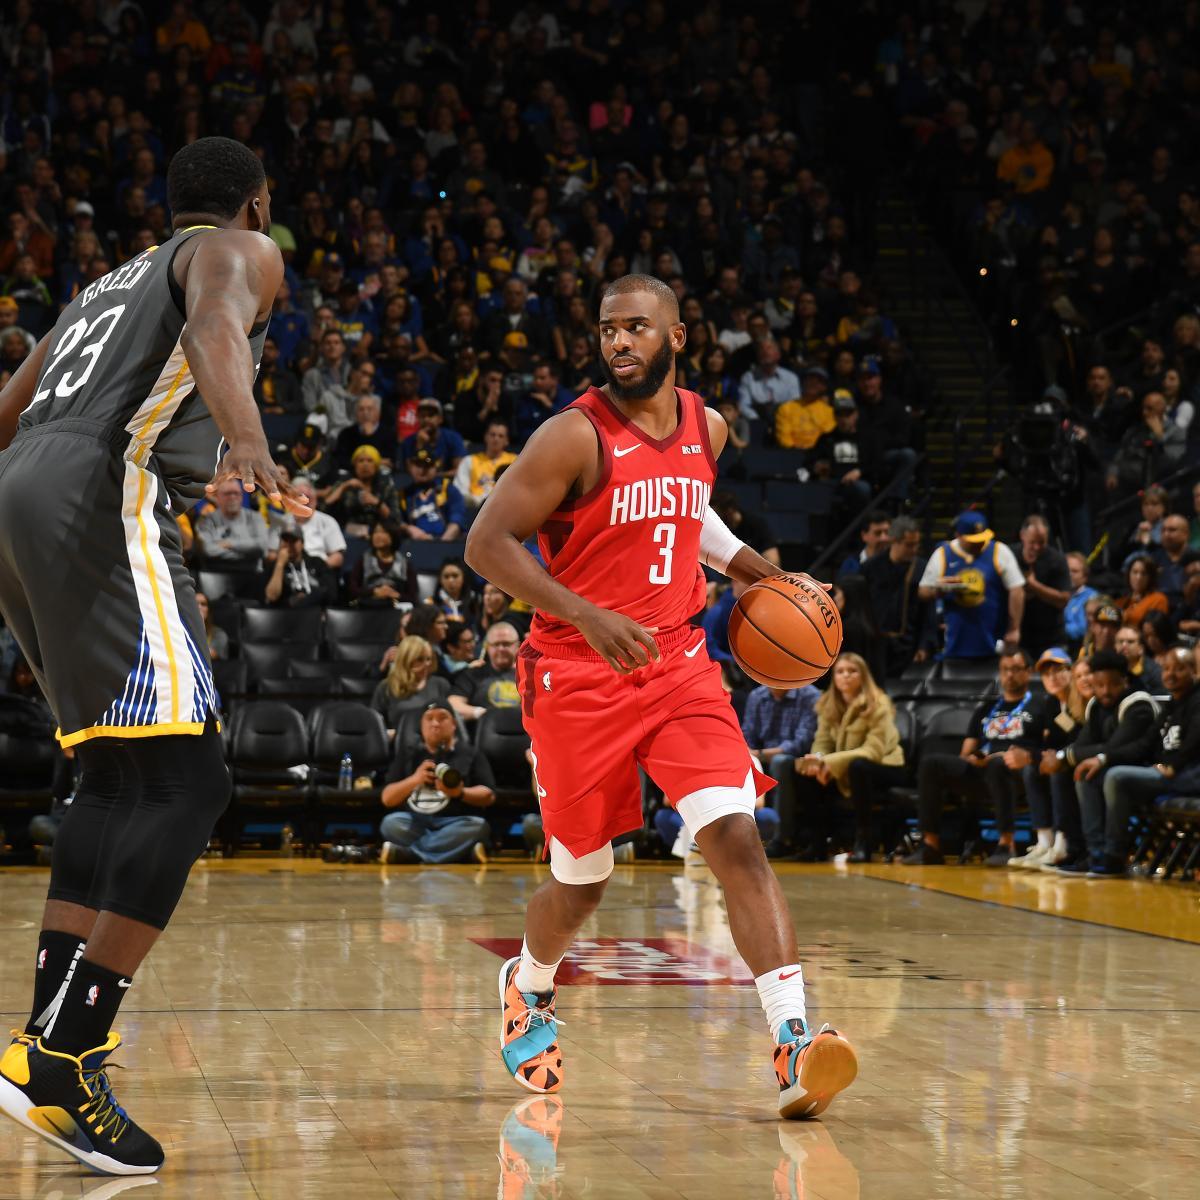 Rockets Vs Warriors Feb 23 2019: Chris Paul Electric As Rockets Beat Kevin Durant, Warriors